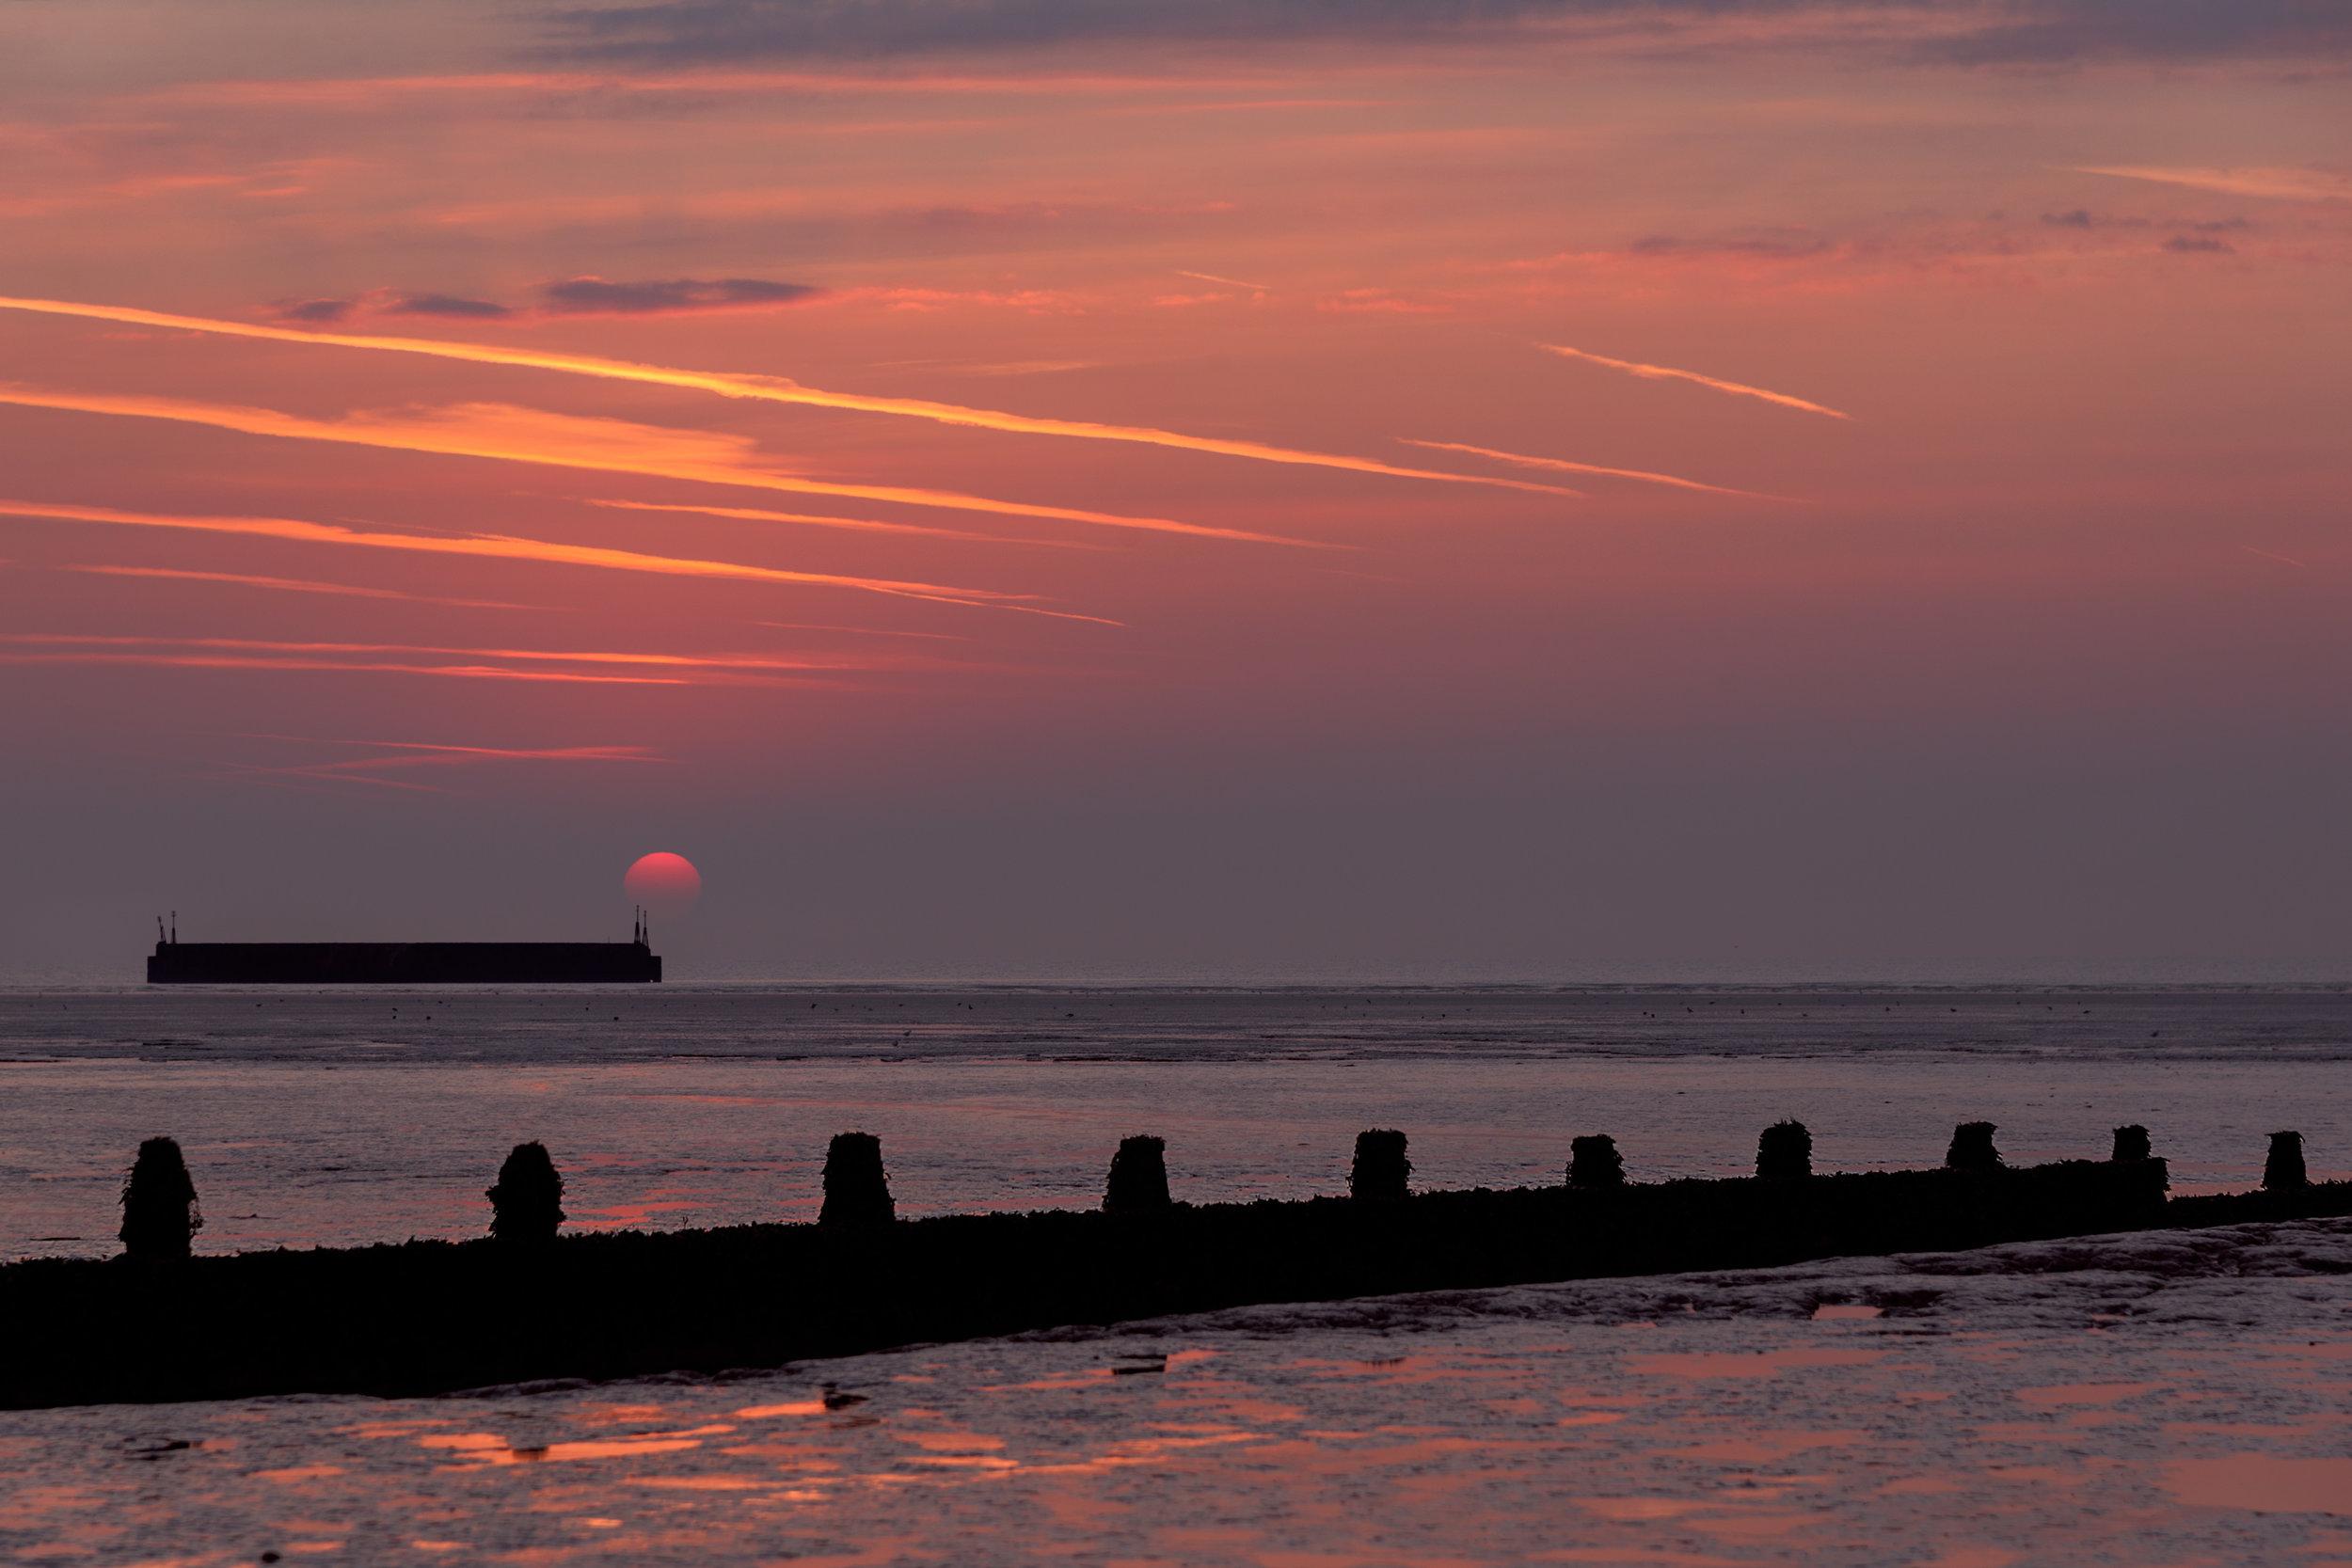 Sunrise at Littlestone-On-Sea in Kent